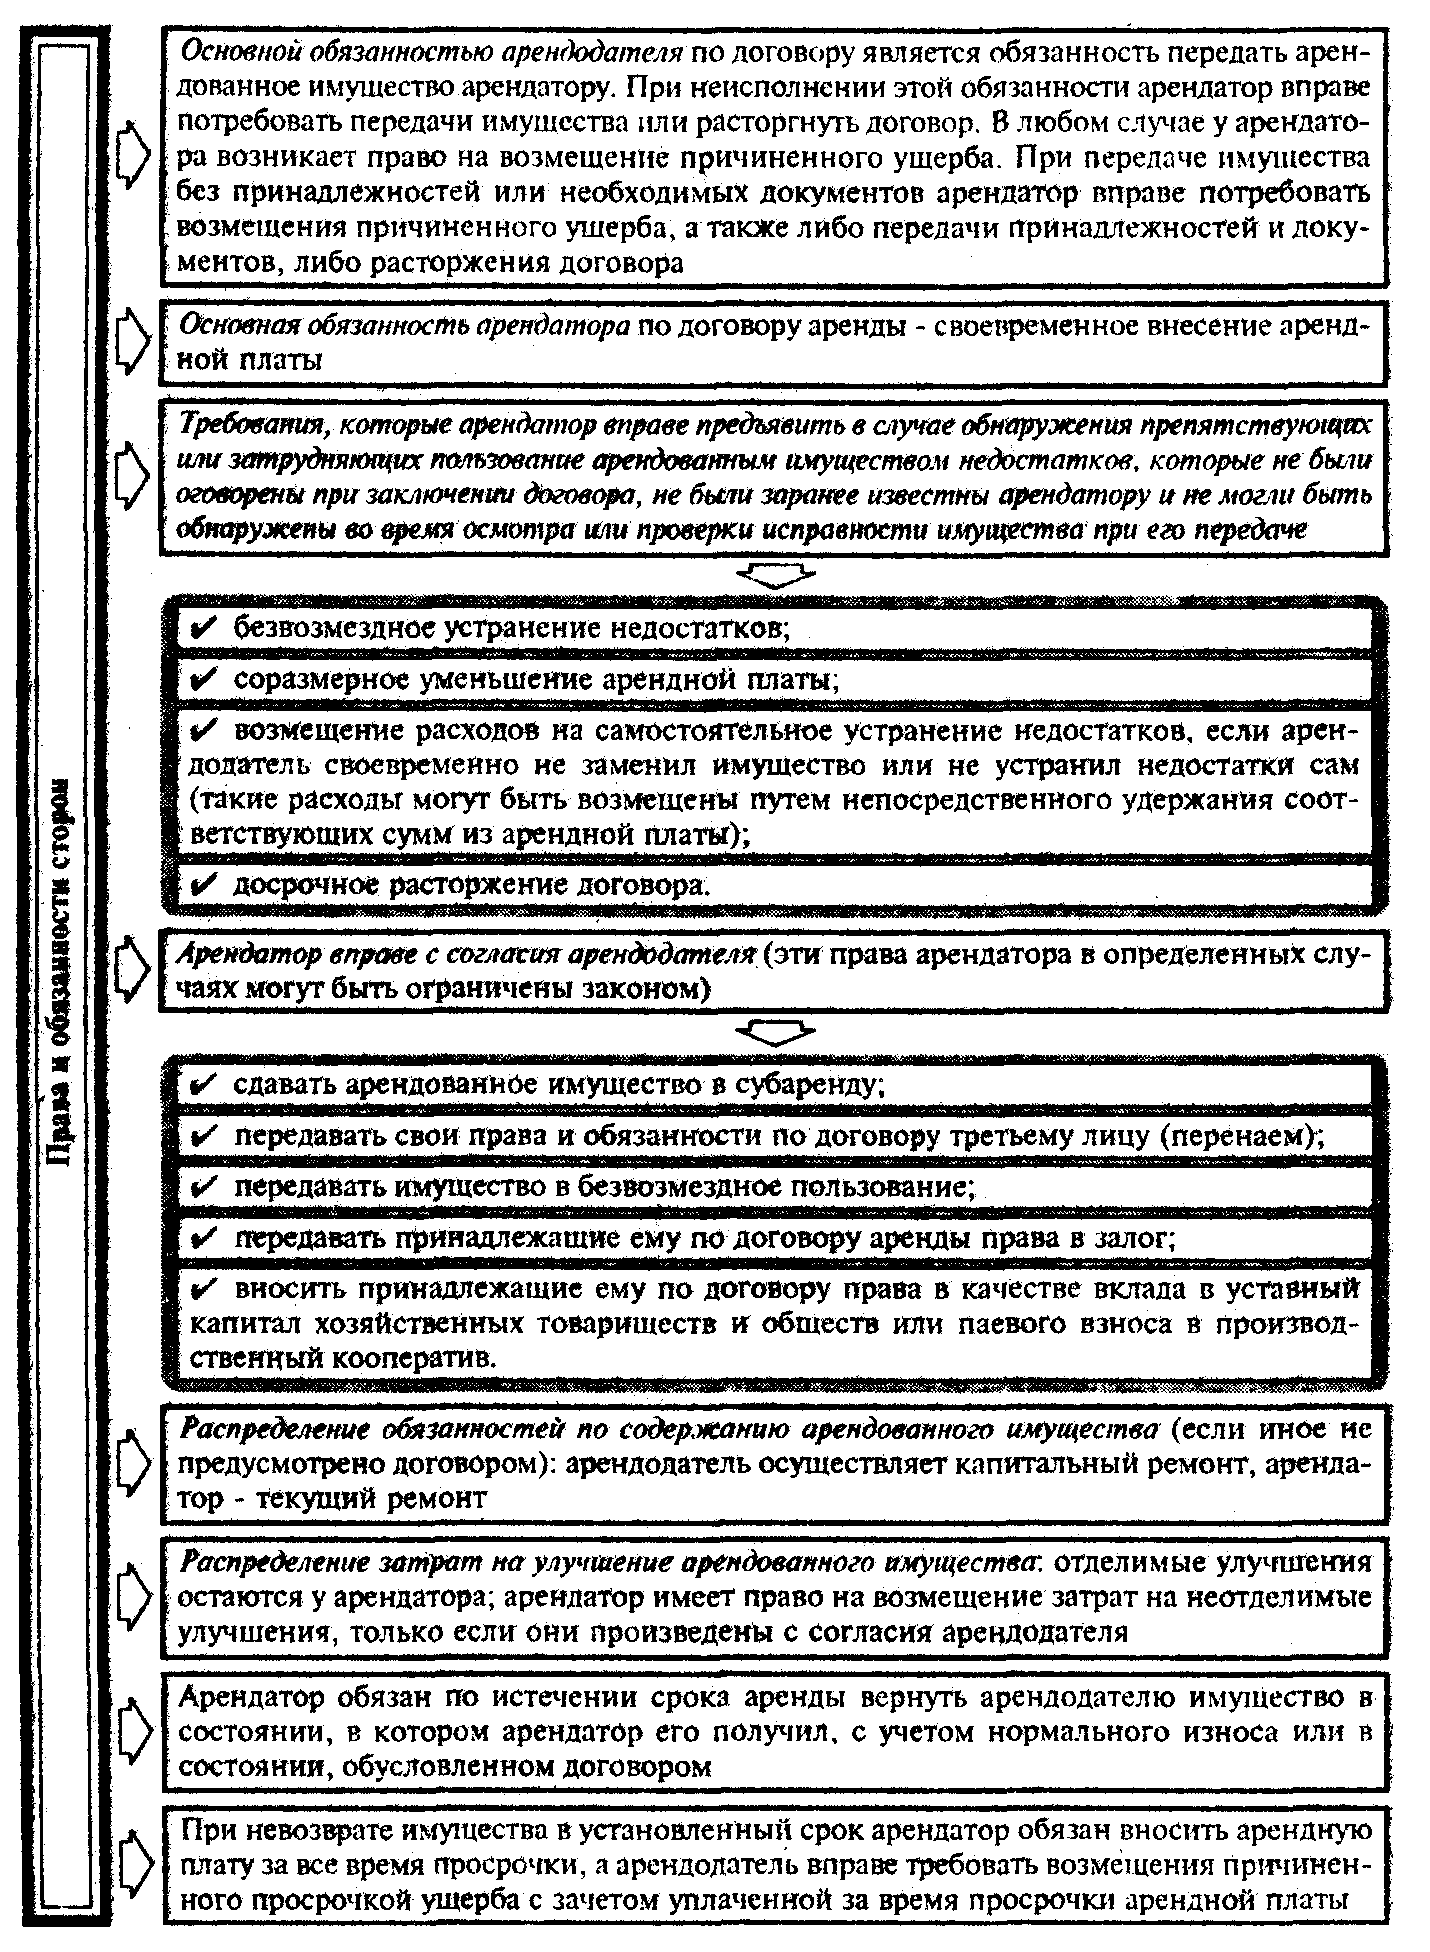 Характеристика договора аренды Права и обязанности сторон по договору аренды